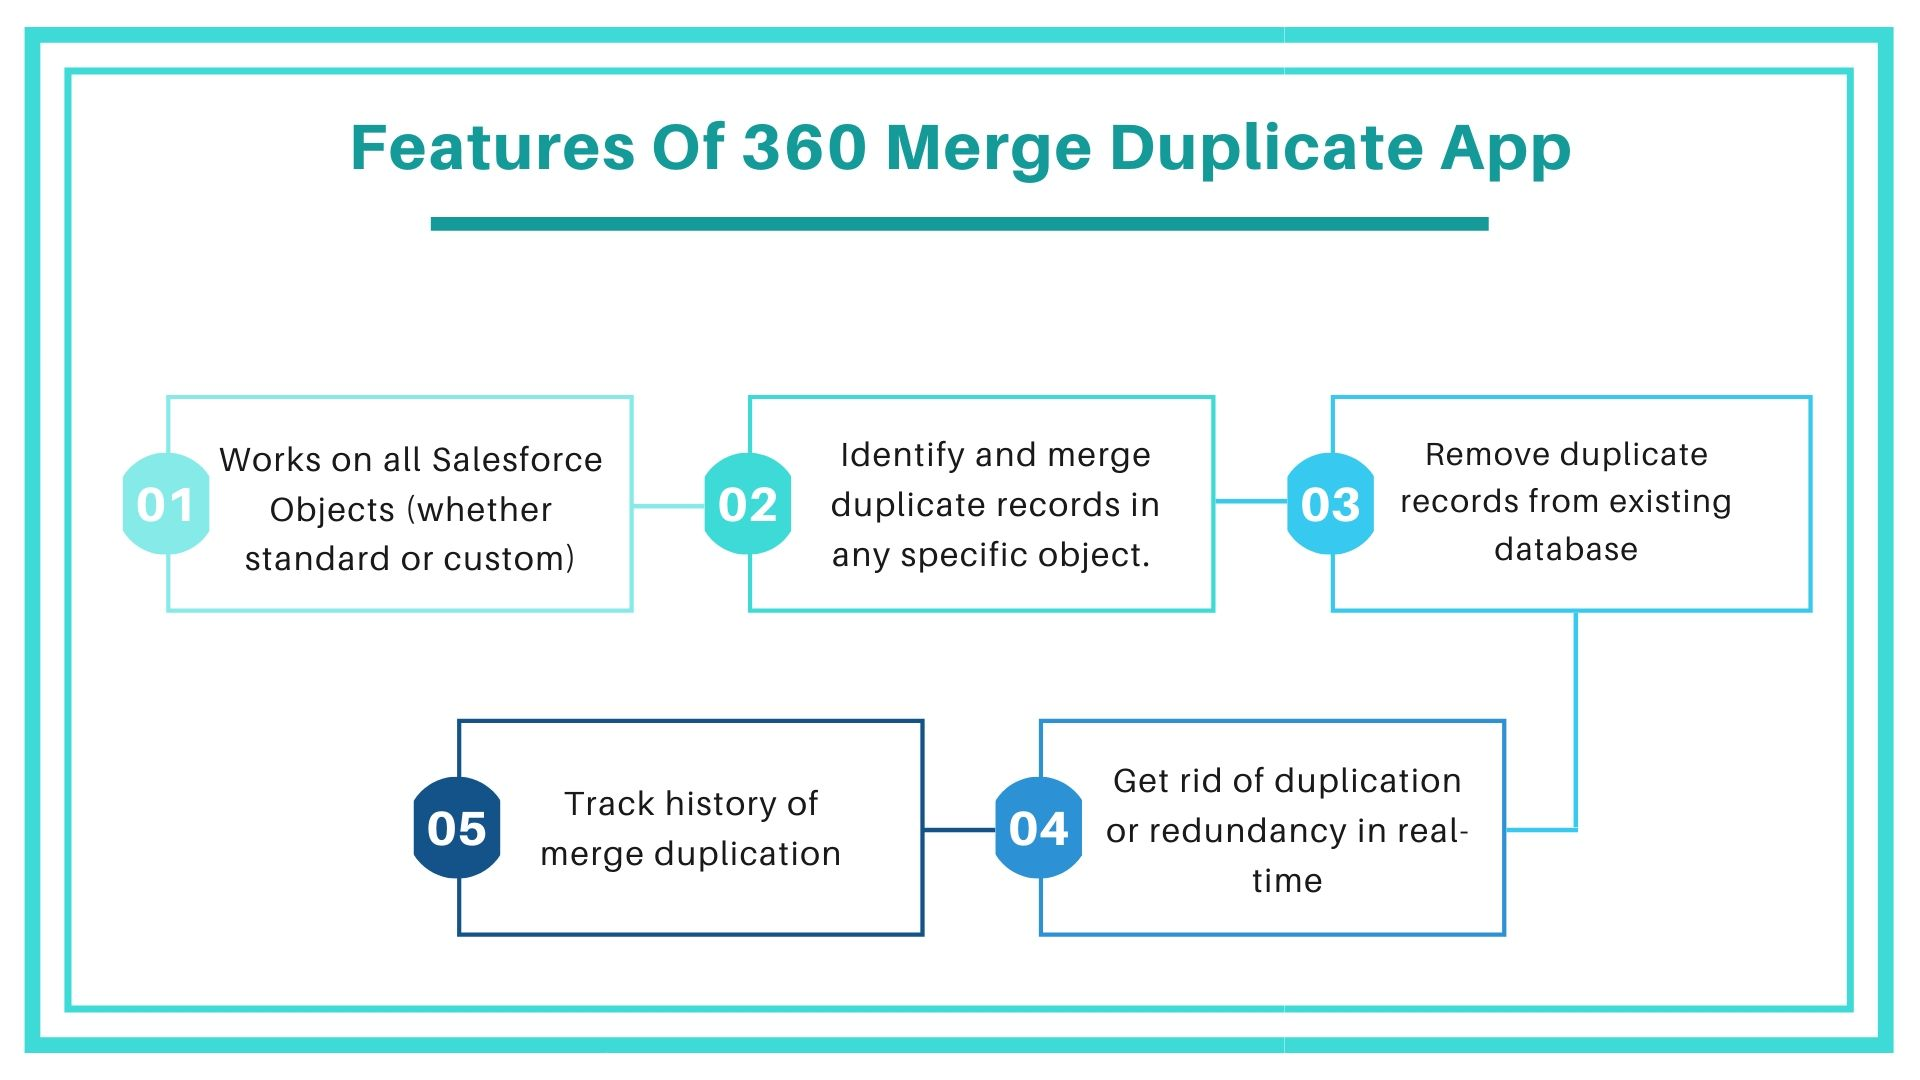 features of 360 merge duplicate app